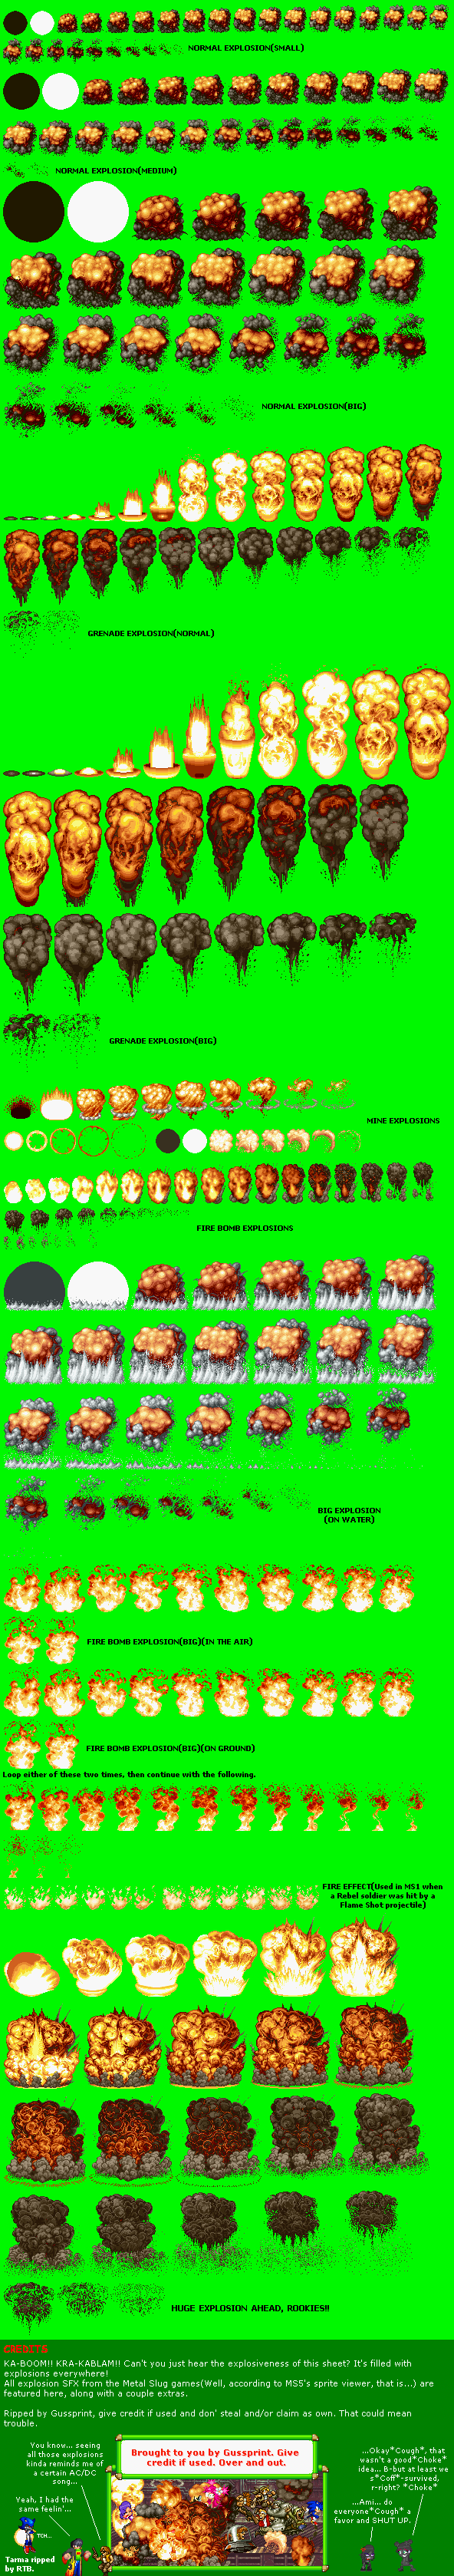 Arcade - Metal Slug - Explosion SFX - The Spriters Resource